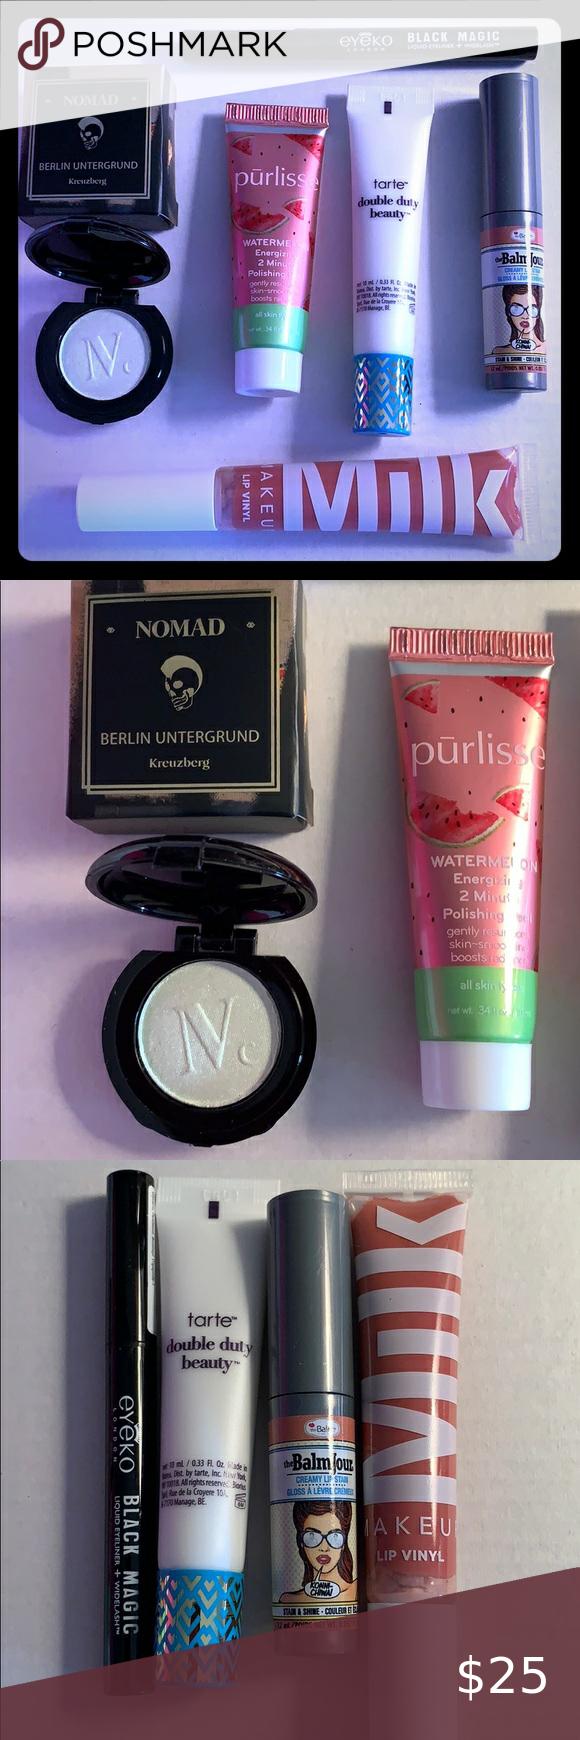 Nomad purlisse tarte Milk Beauty Bundle New in 2020